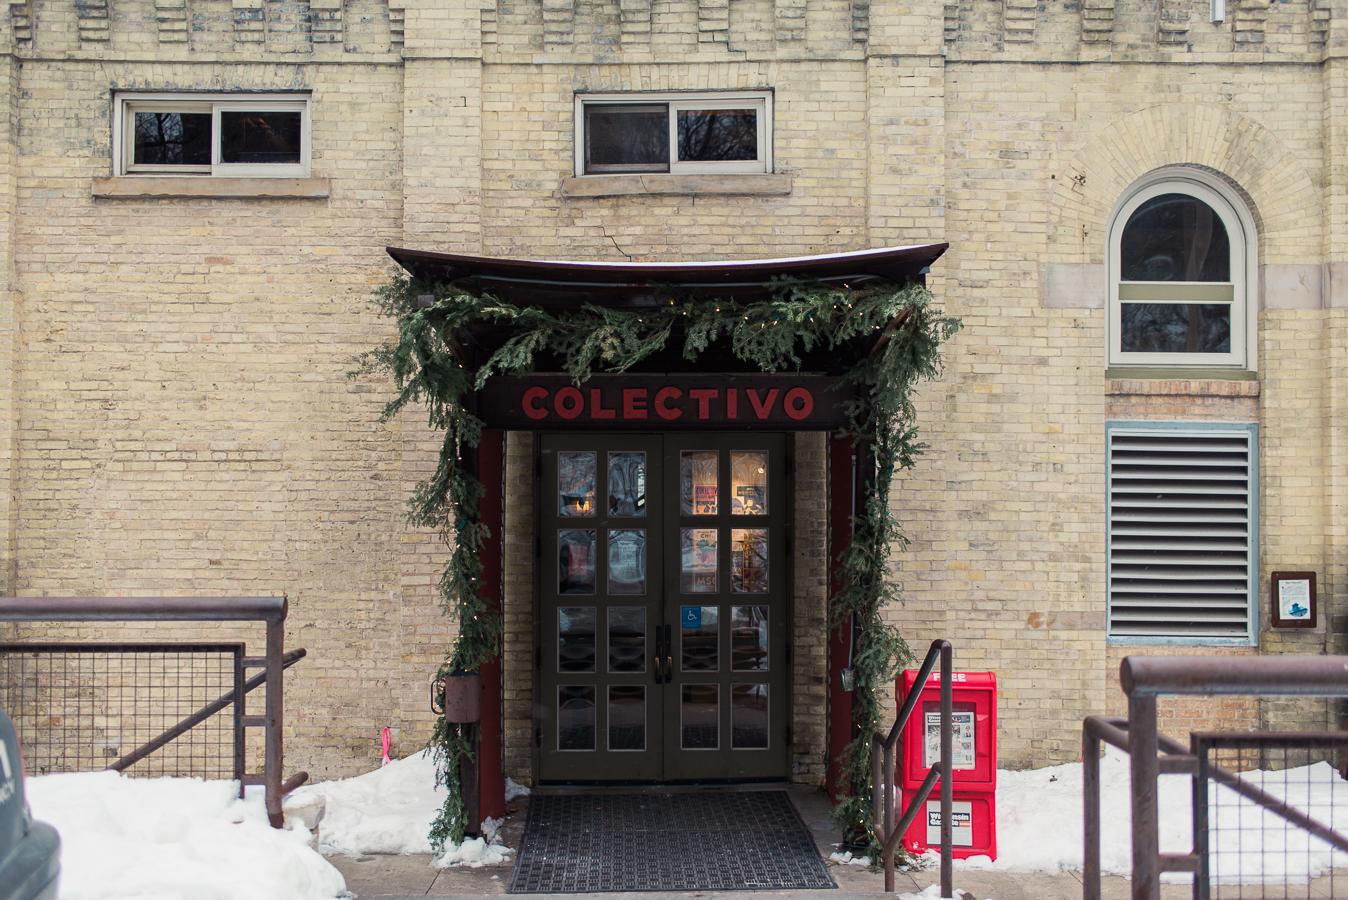 Beautyosuaurs Lex-Alex Good-Lifestyle Blog-Milwaukee Art Museum-Gap Jeans-J.Crew-Sweater-Stripes-Loafers-Winter